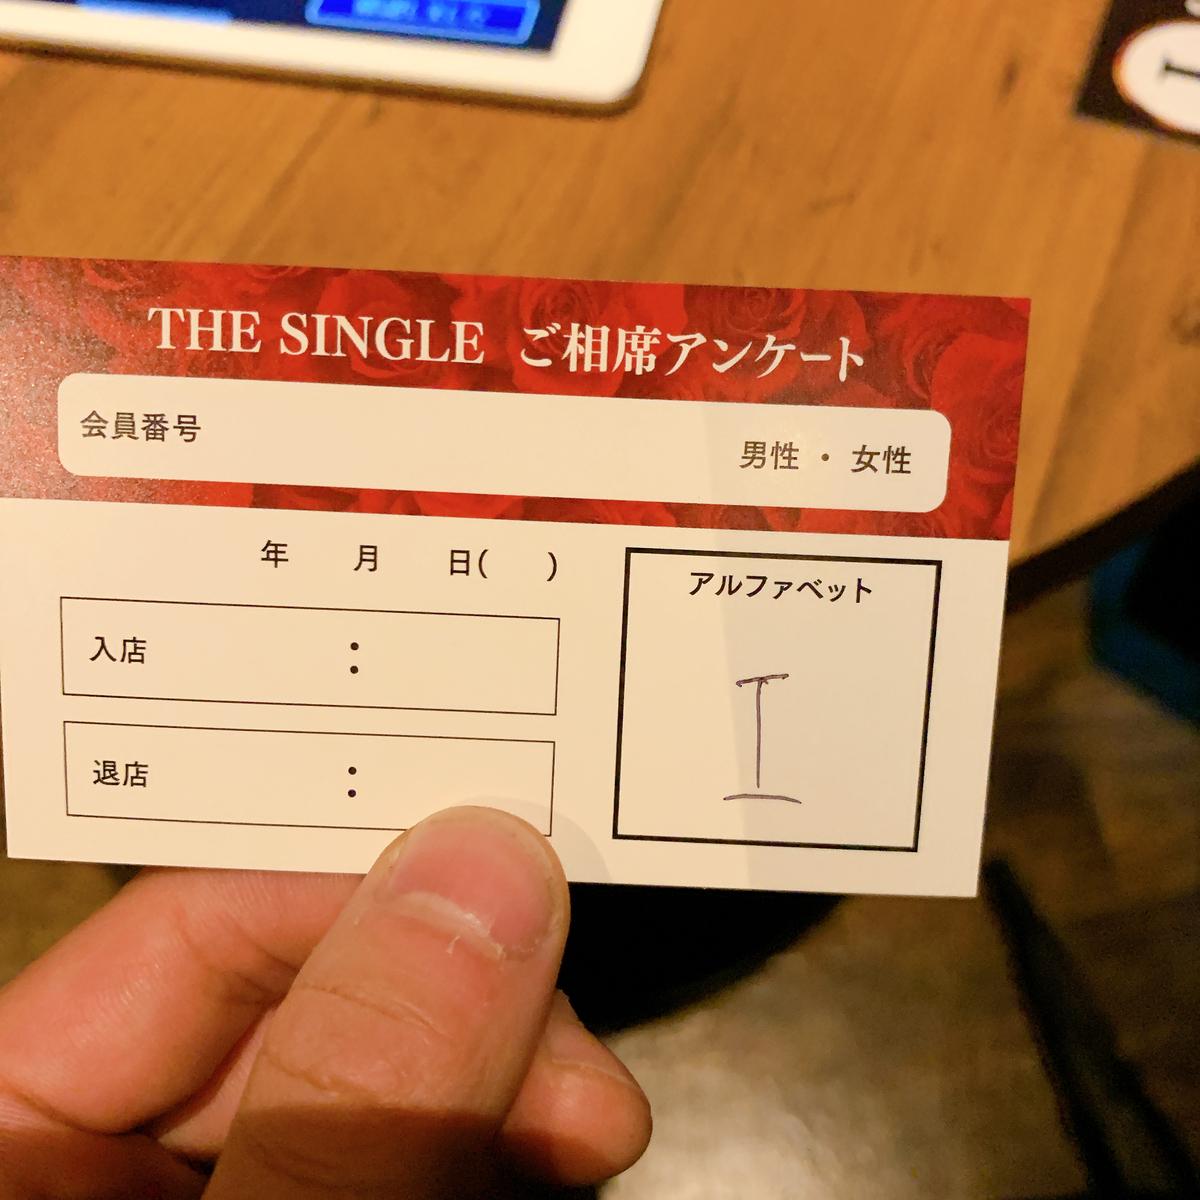 THE SINGLE